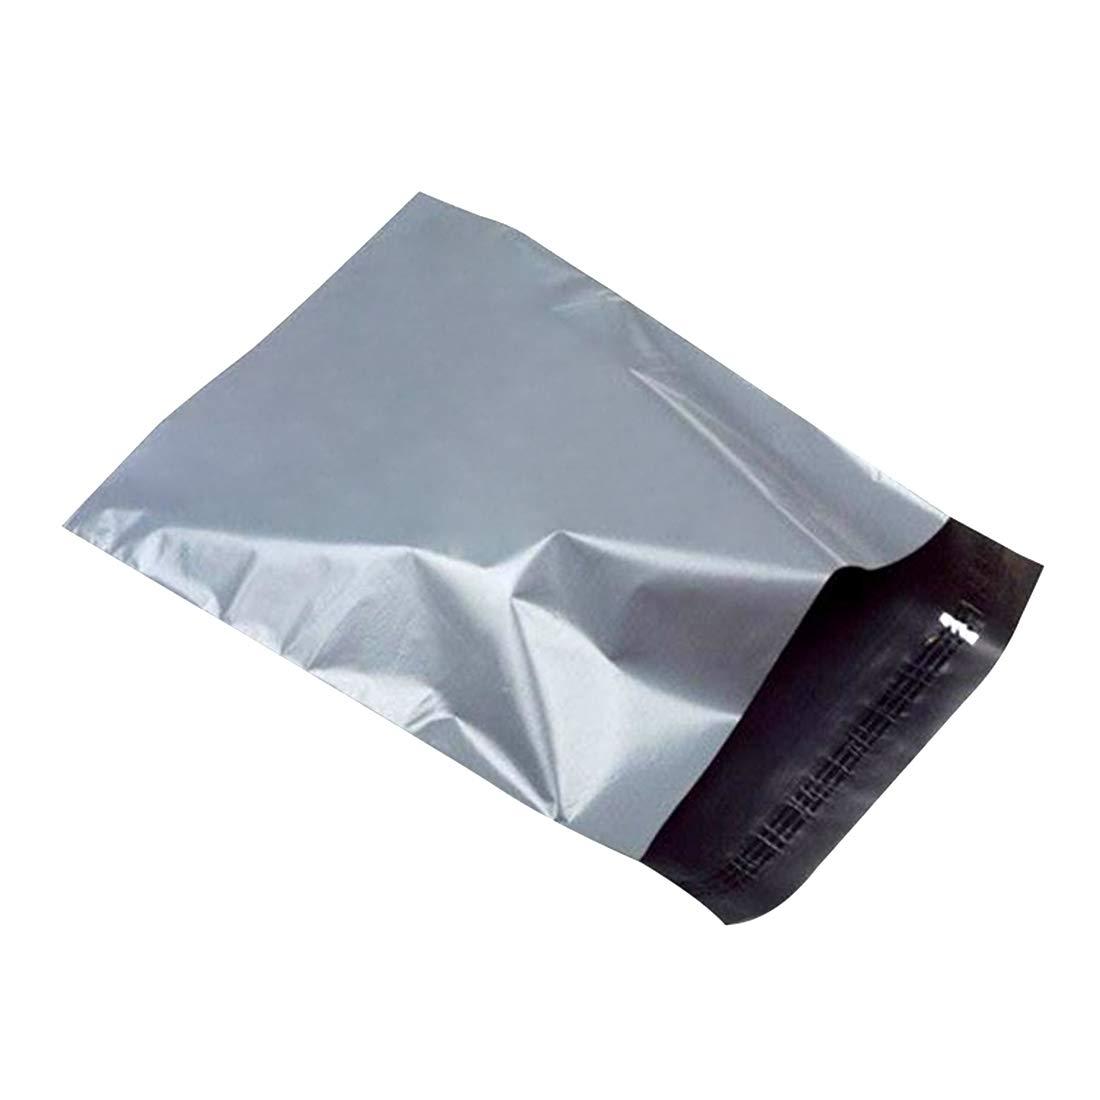 Packing Supplies Mailing Bag Air Column Cushion Bag Packing 20 x 29 cm Label Tape Size